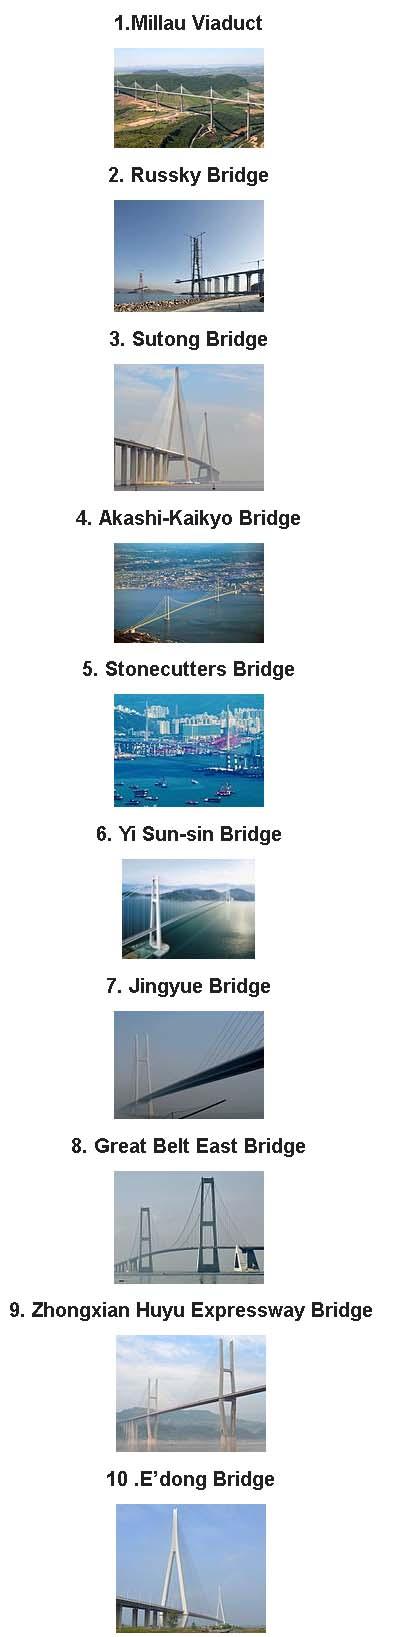 TOP 10 TALLEST BRIDGES OF THE WORLD